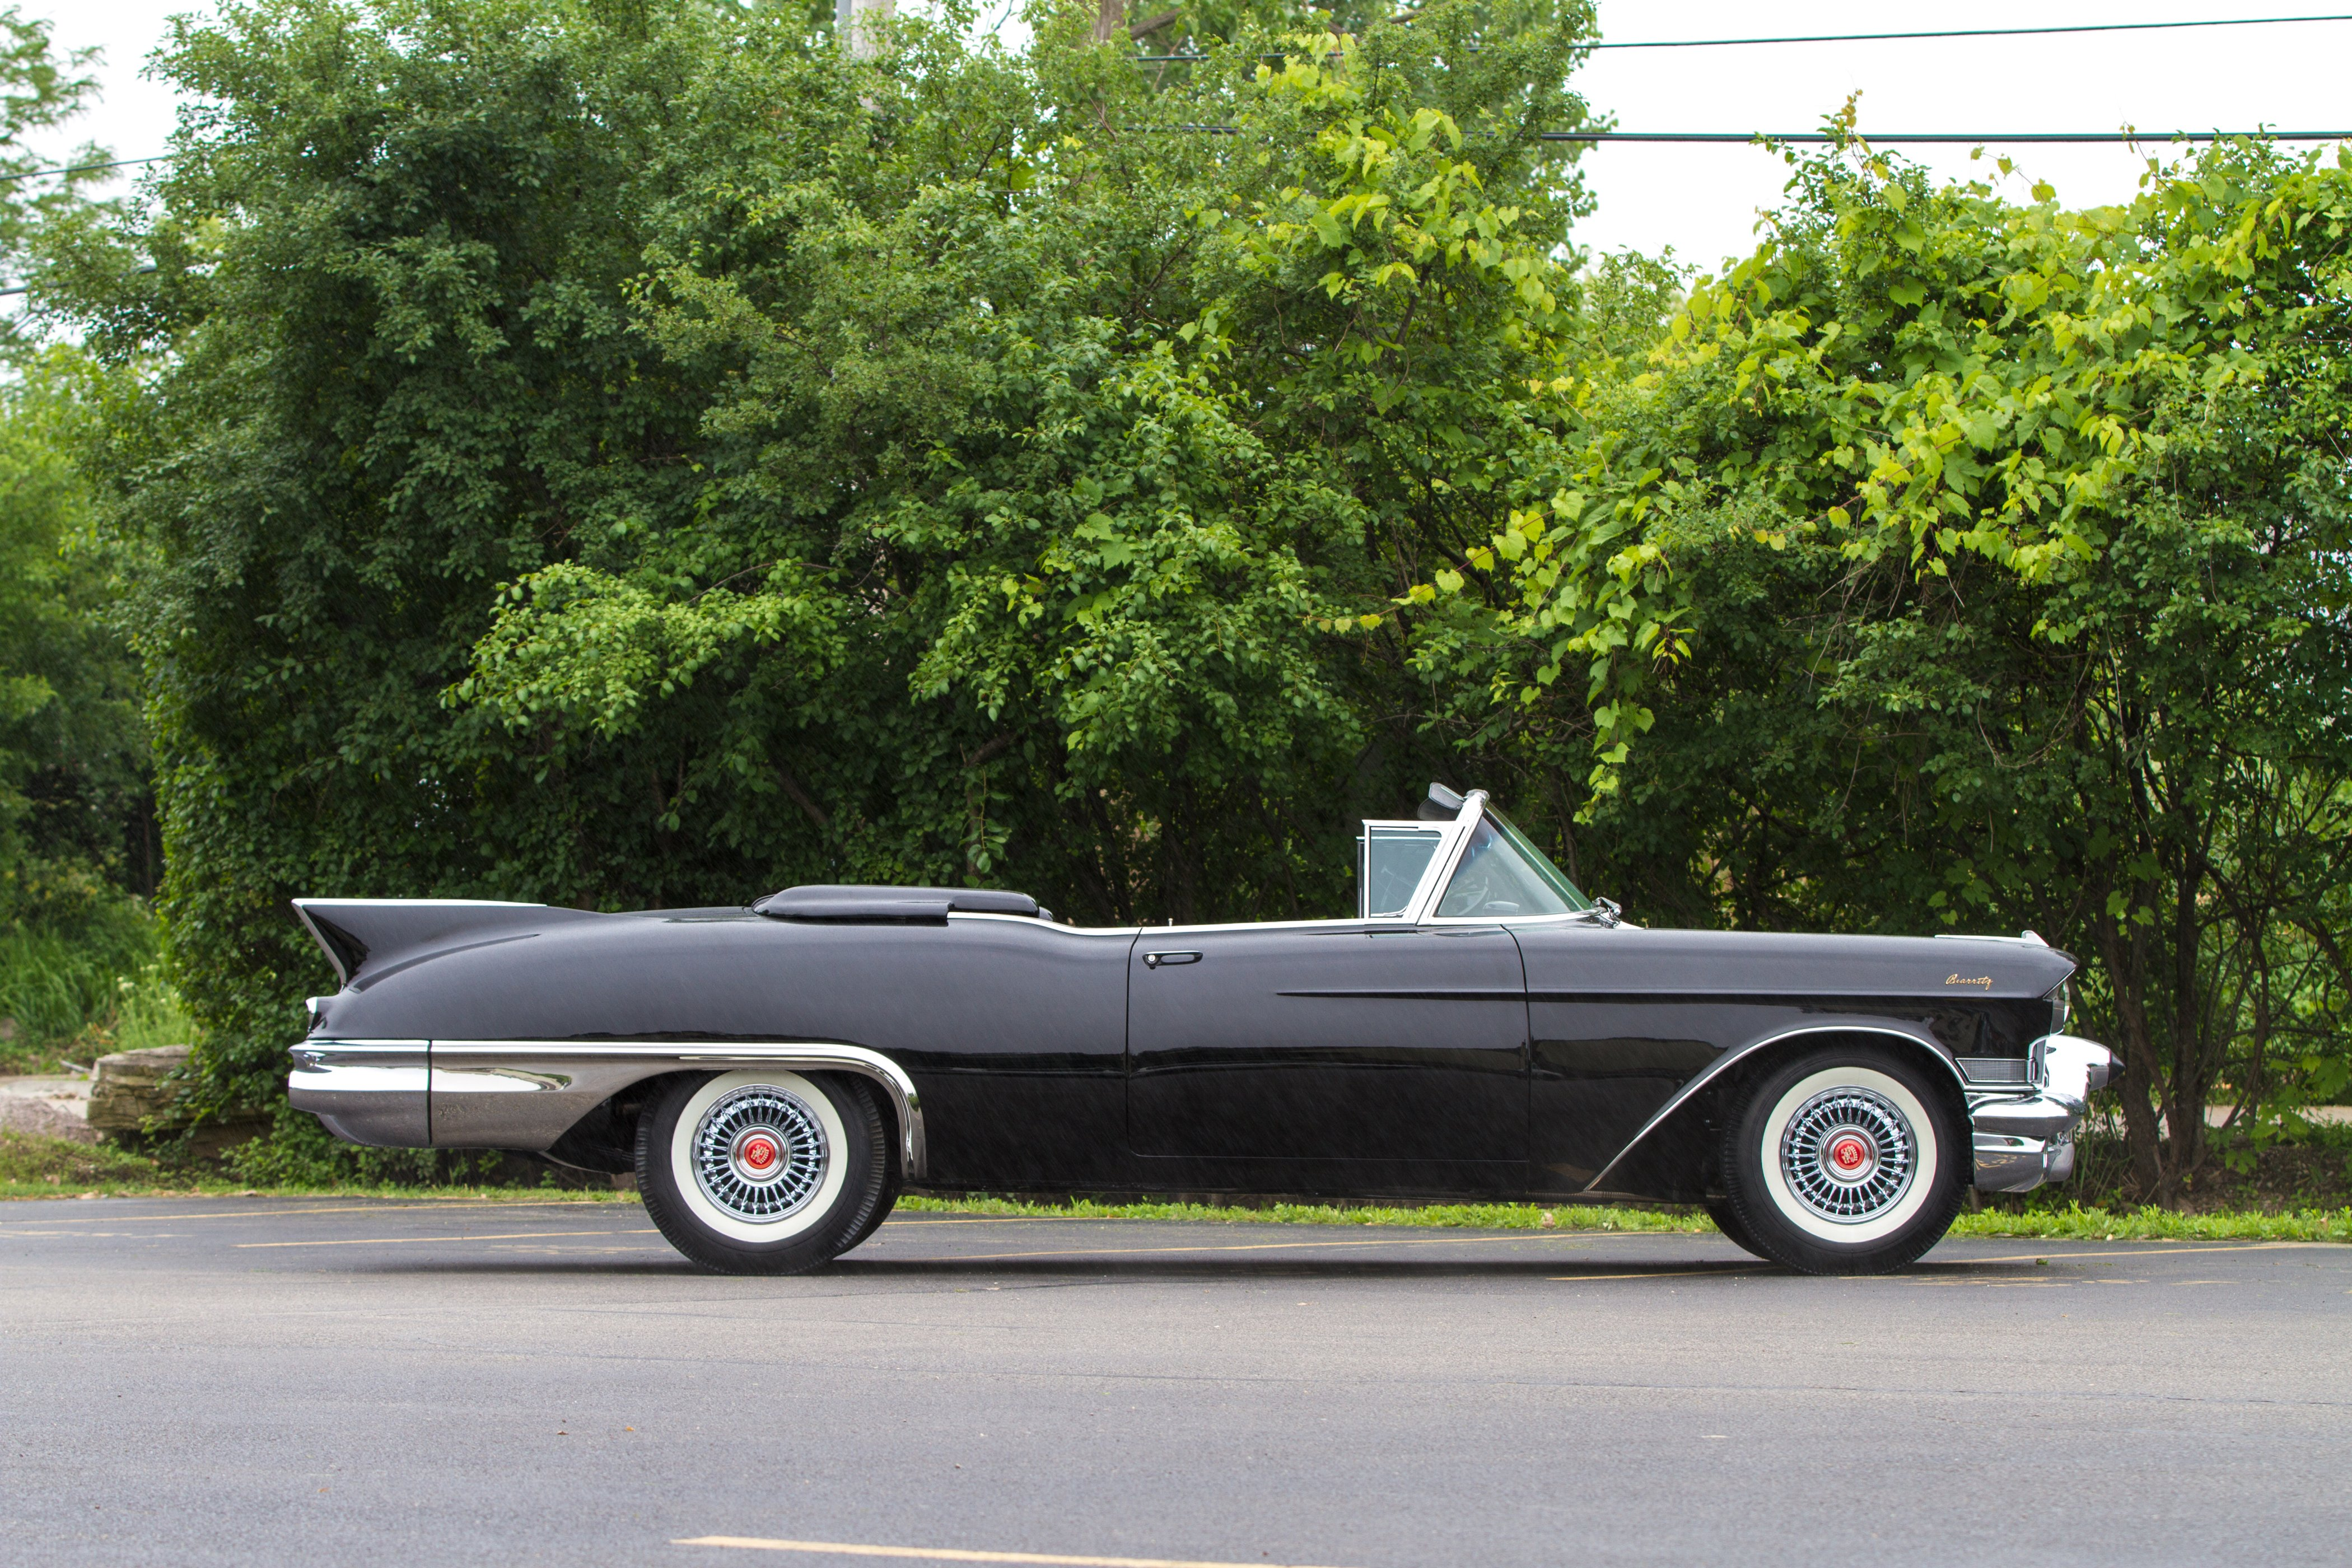 Cadillac Convertible 2015 >> 1957 Cadillac Eldorado Biarritz Convertible Classic USA 4200x2800-03 wallpaper | 4200x2800 ...